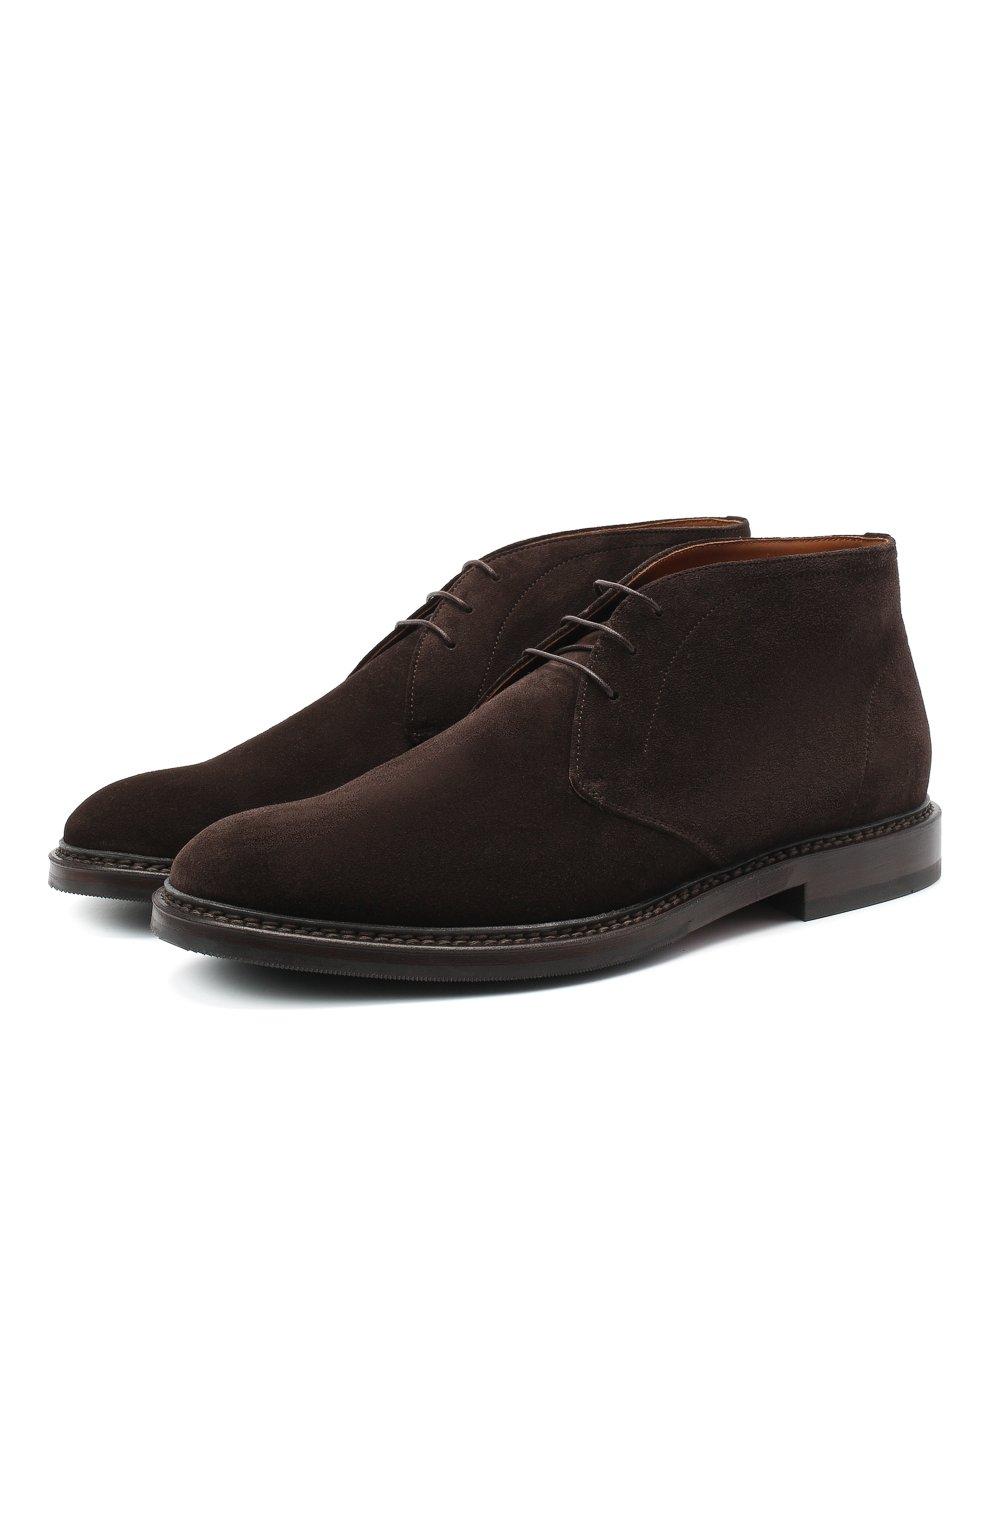 Мужские замшевые ботинки BRUNELLO CUCINELLI темно-коричневого цвета, арт. MZUJCAU892 | Фото 1